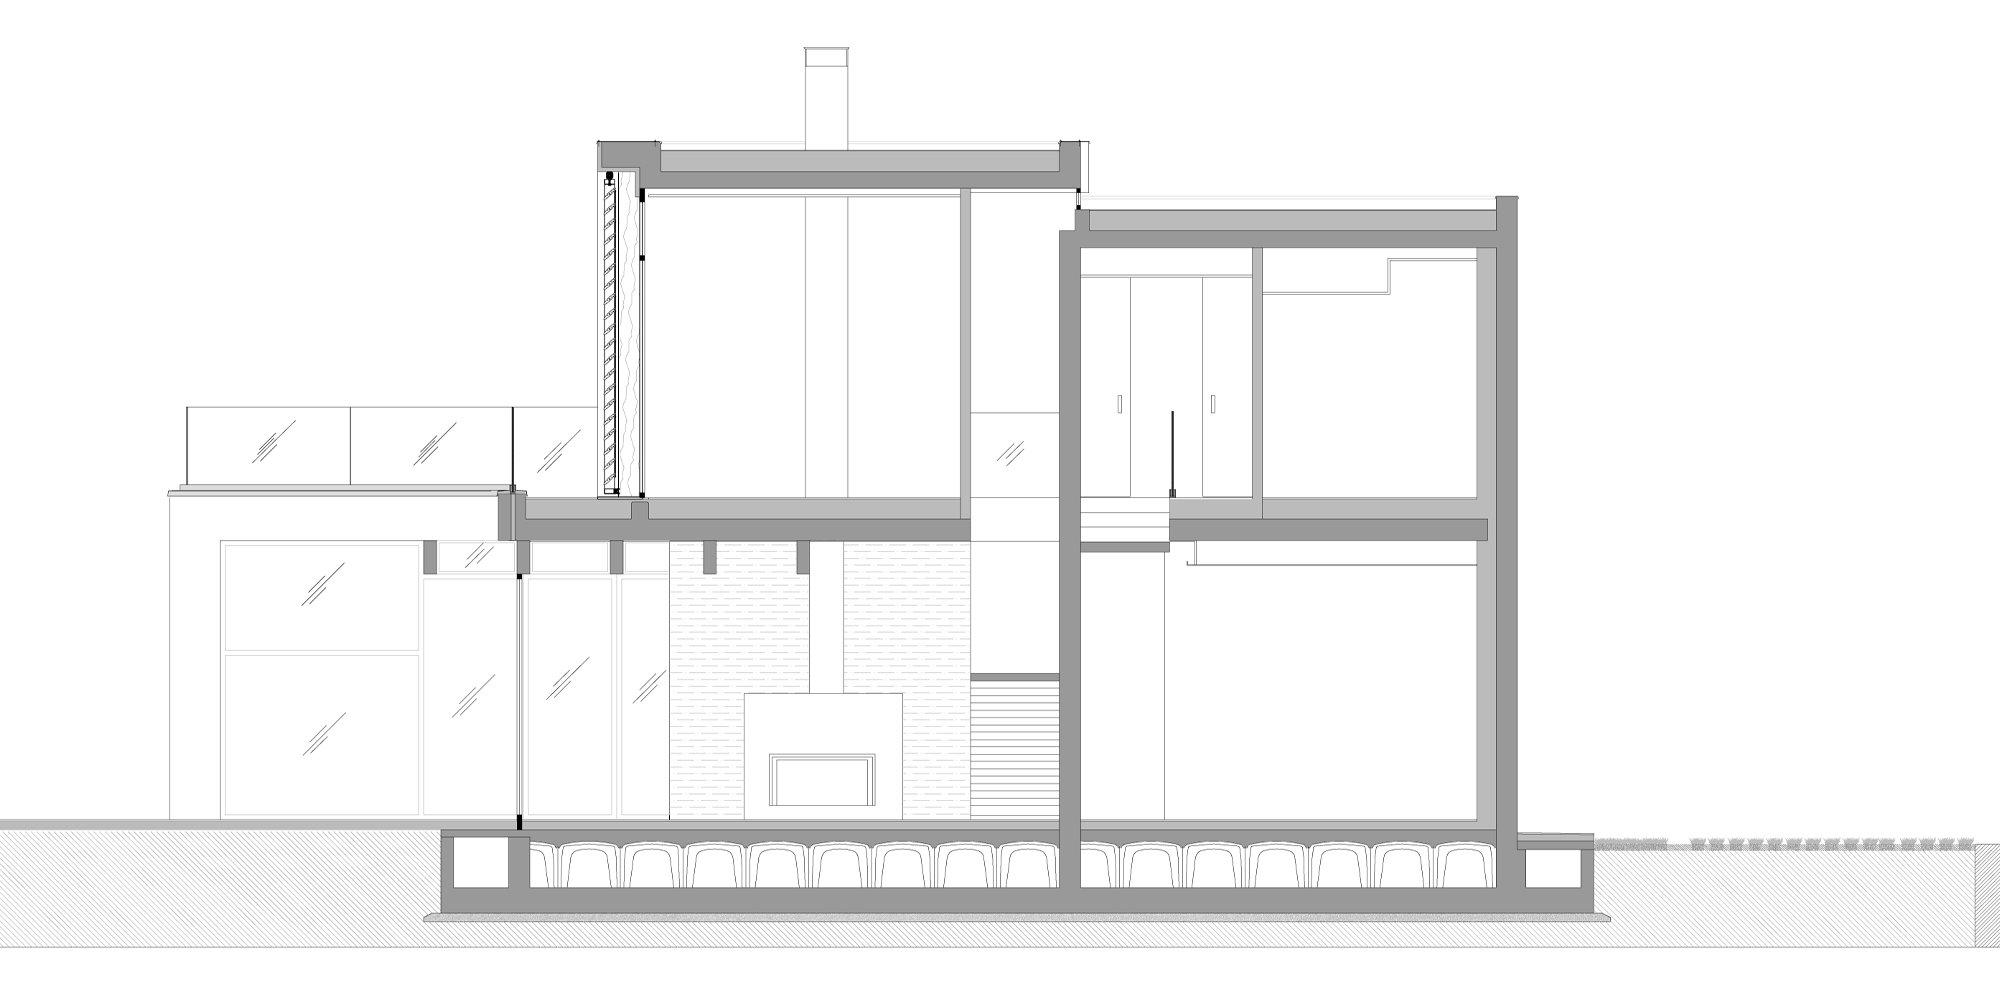 Sezione CC © Giraldi Associati Architetti